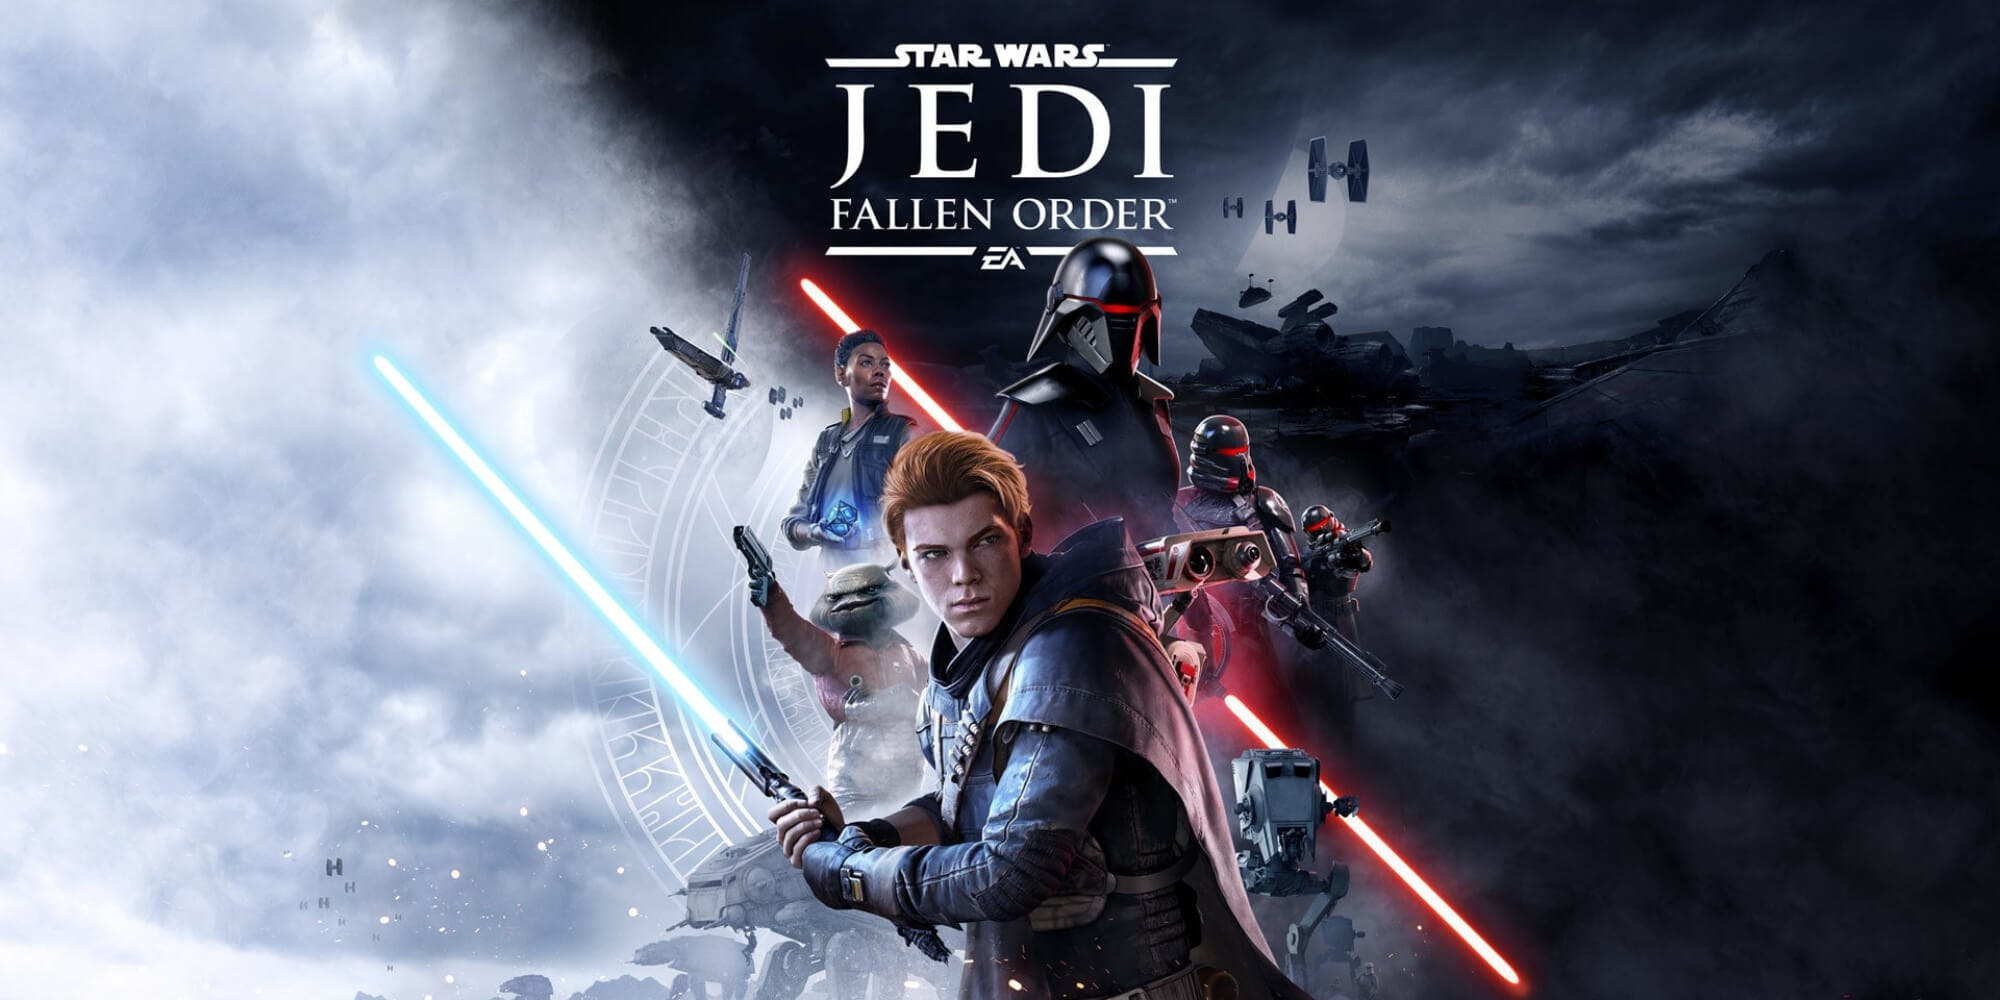 new games 2019 star wars jedi fallen order